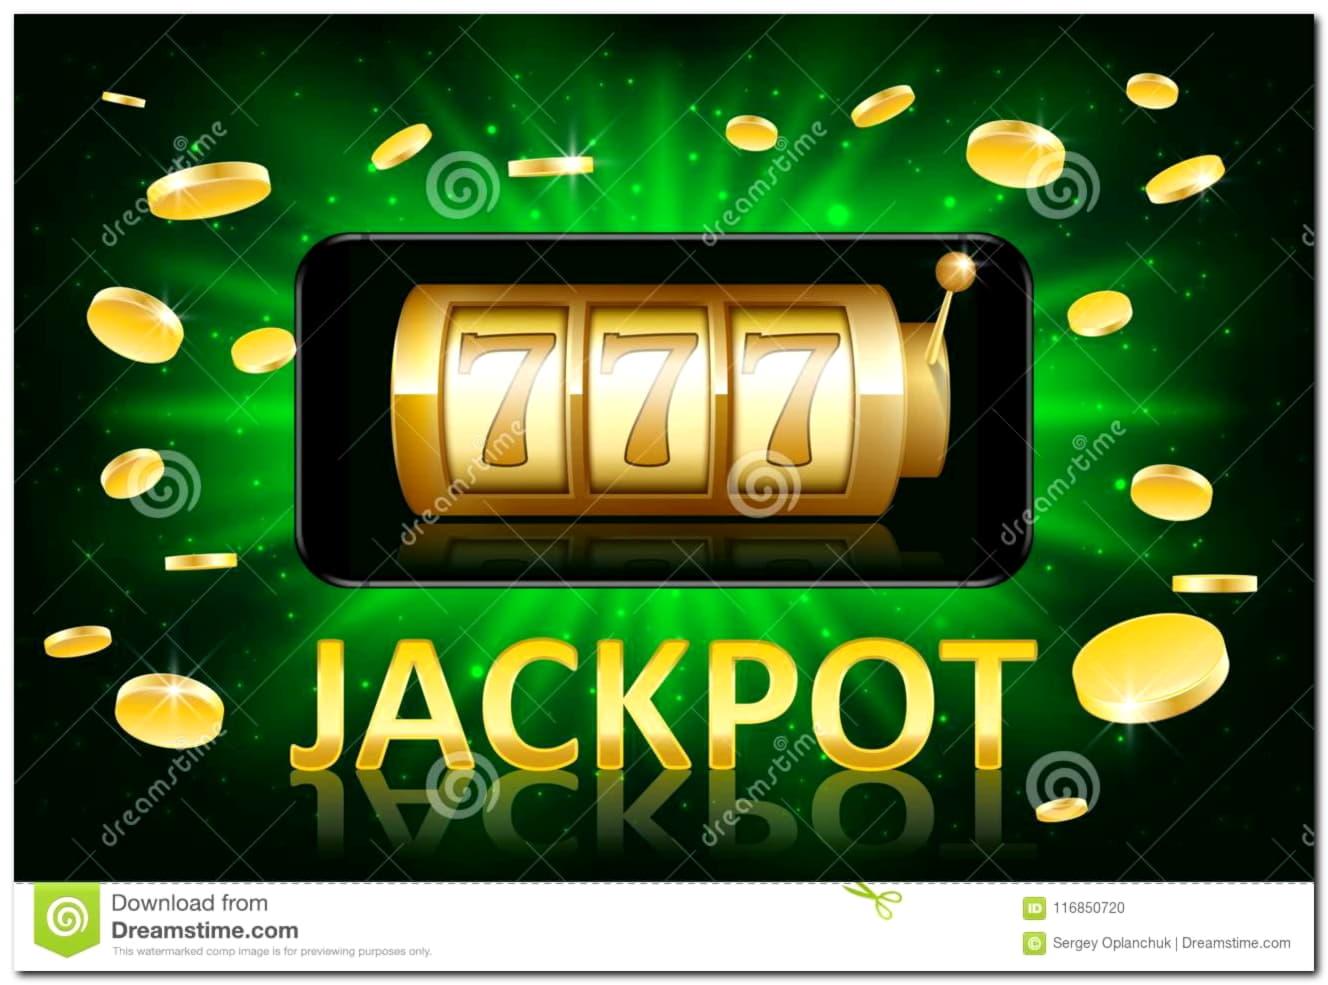 £85 FREE CASINO CHIP at Cashmio Casino